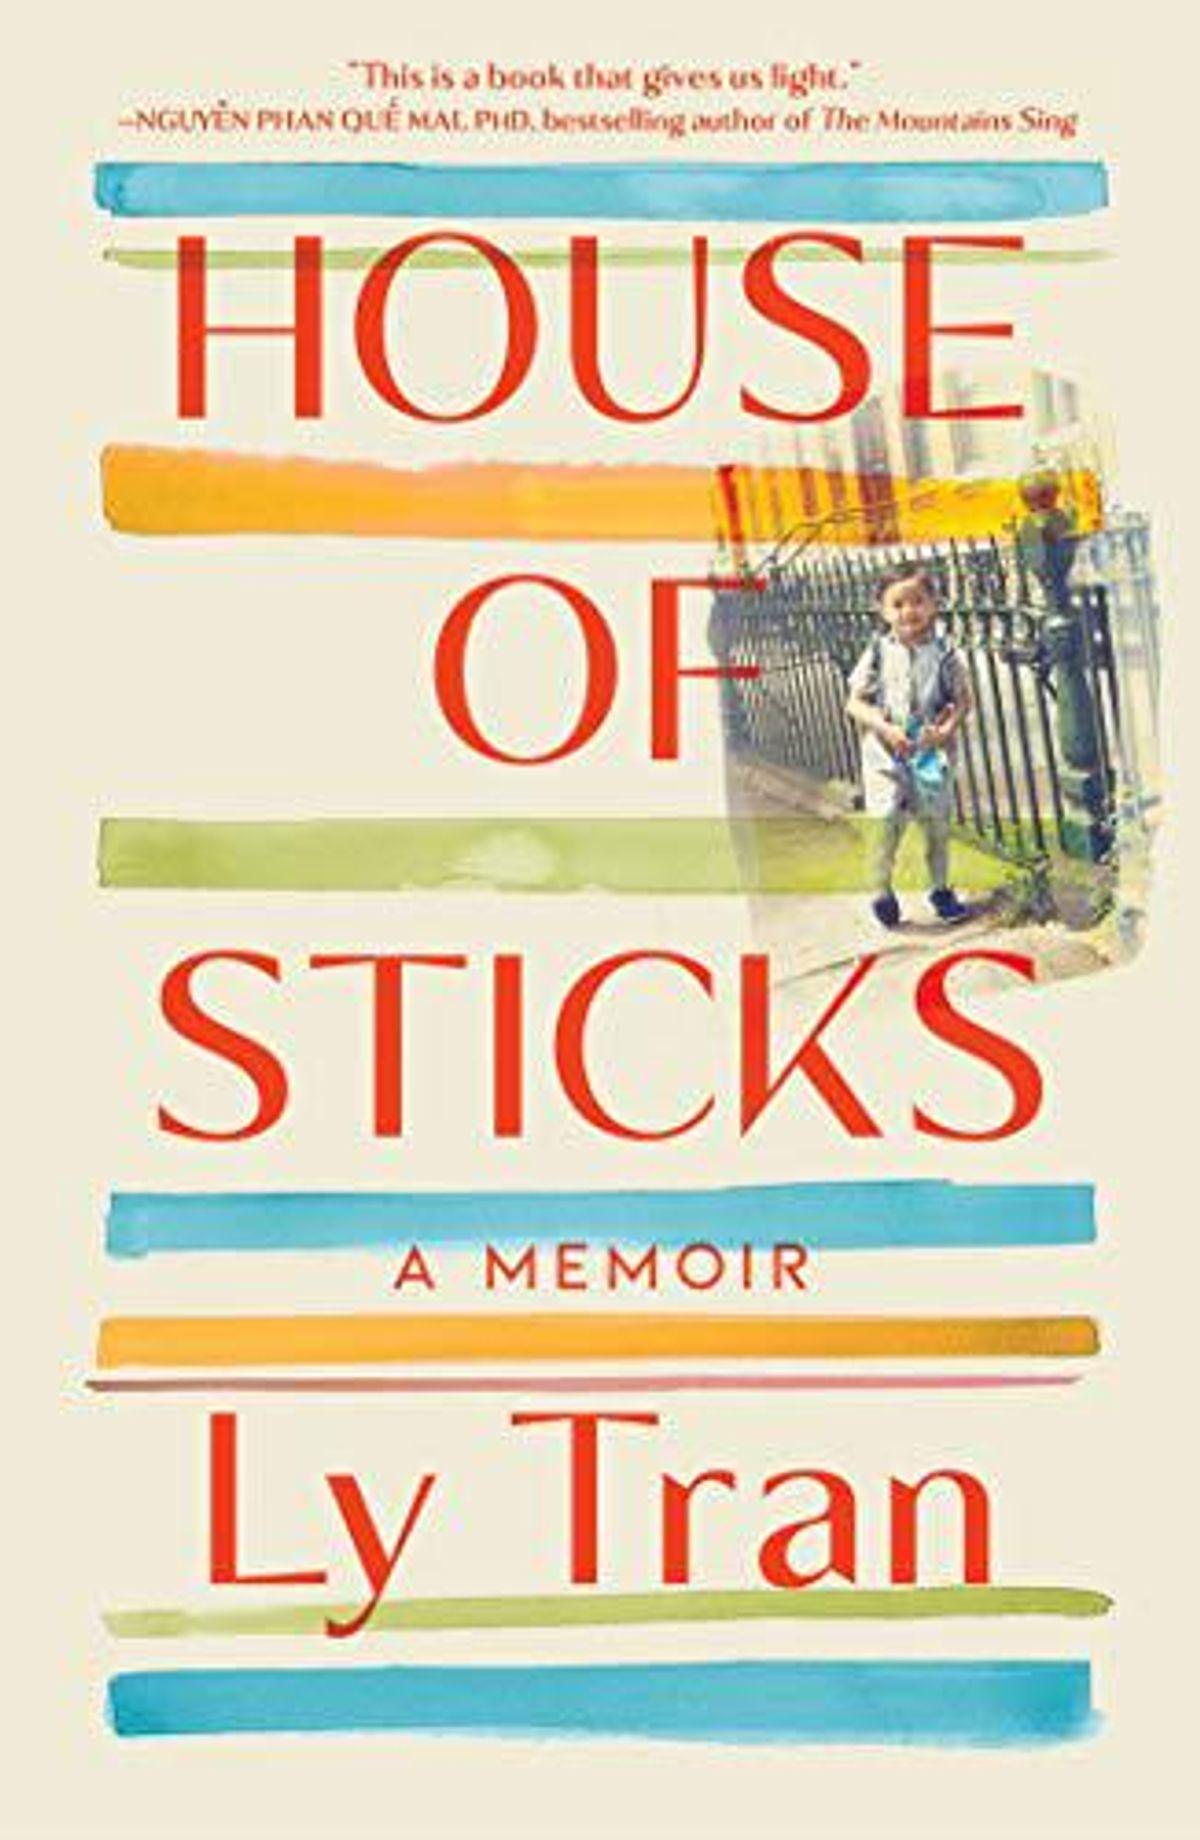 ly tran house of sticks a memoir